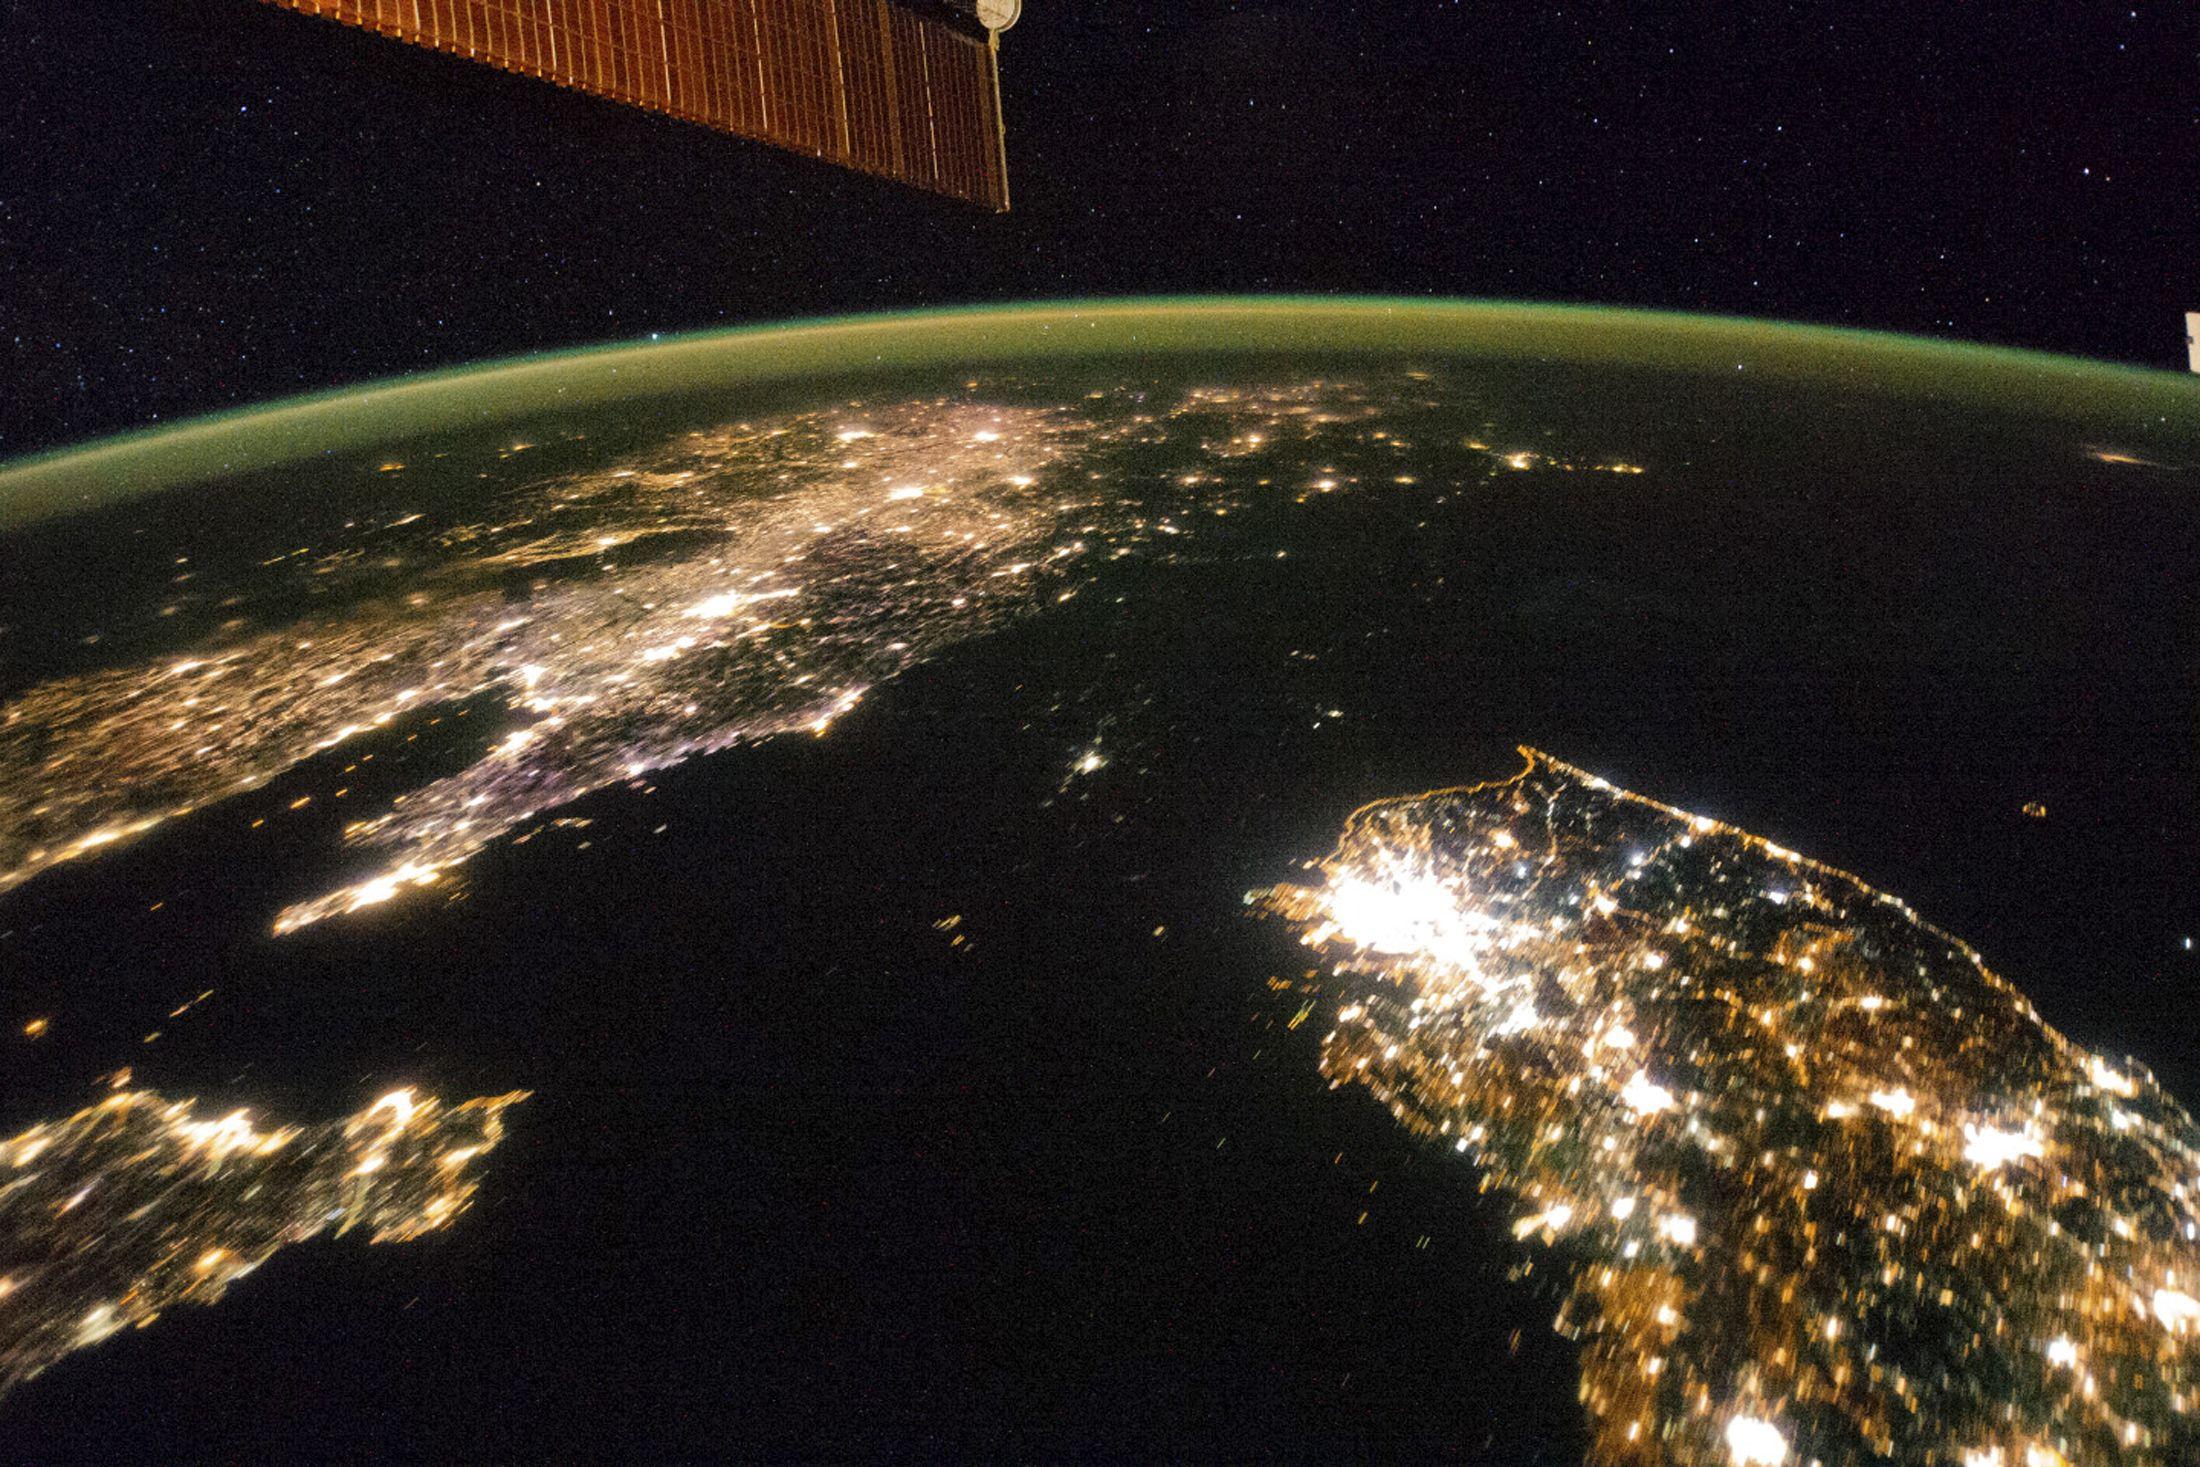 2-10-15 North Korea satellite